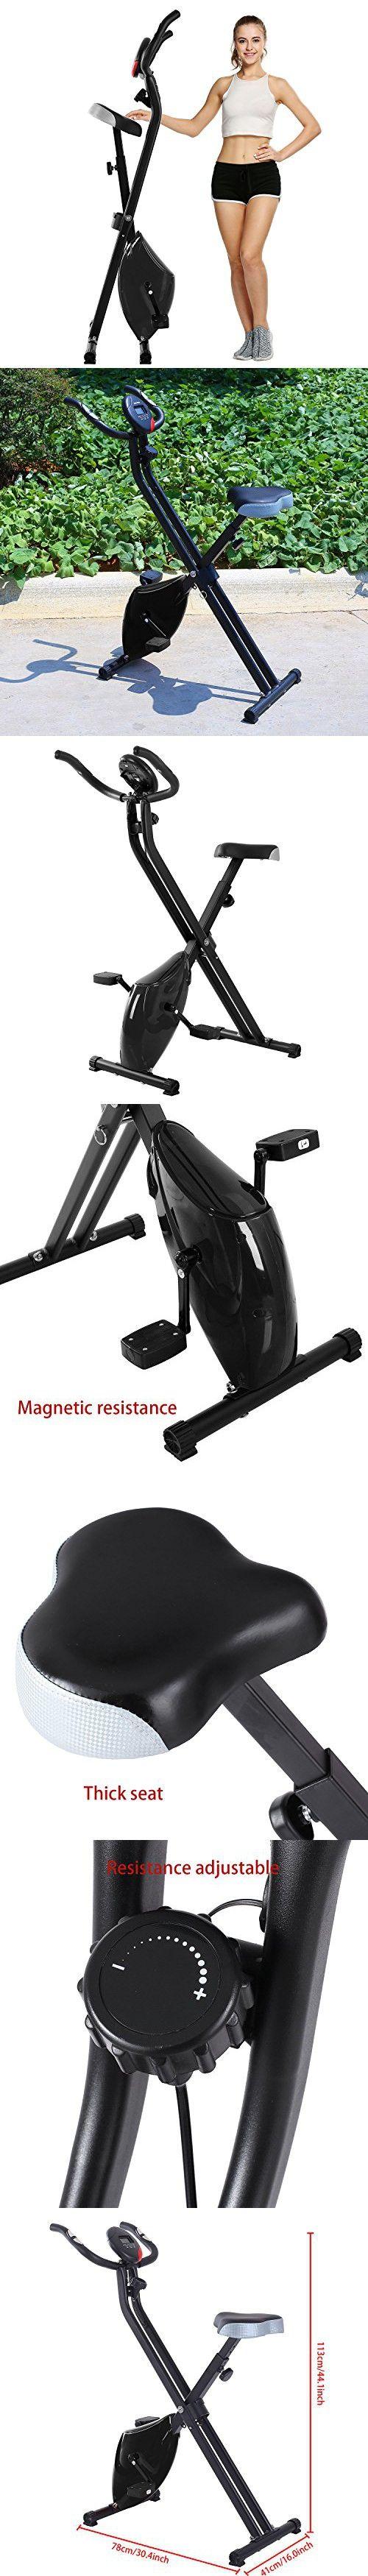 Fanala Folding Magnetic Upright Exercise Bike with Pulse Fitness Equipment US Fast (Black)